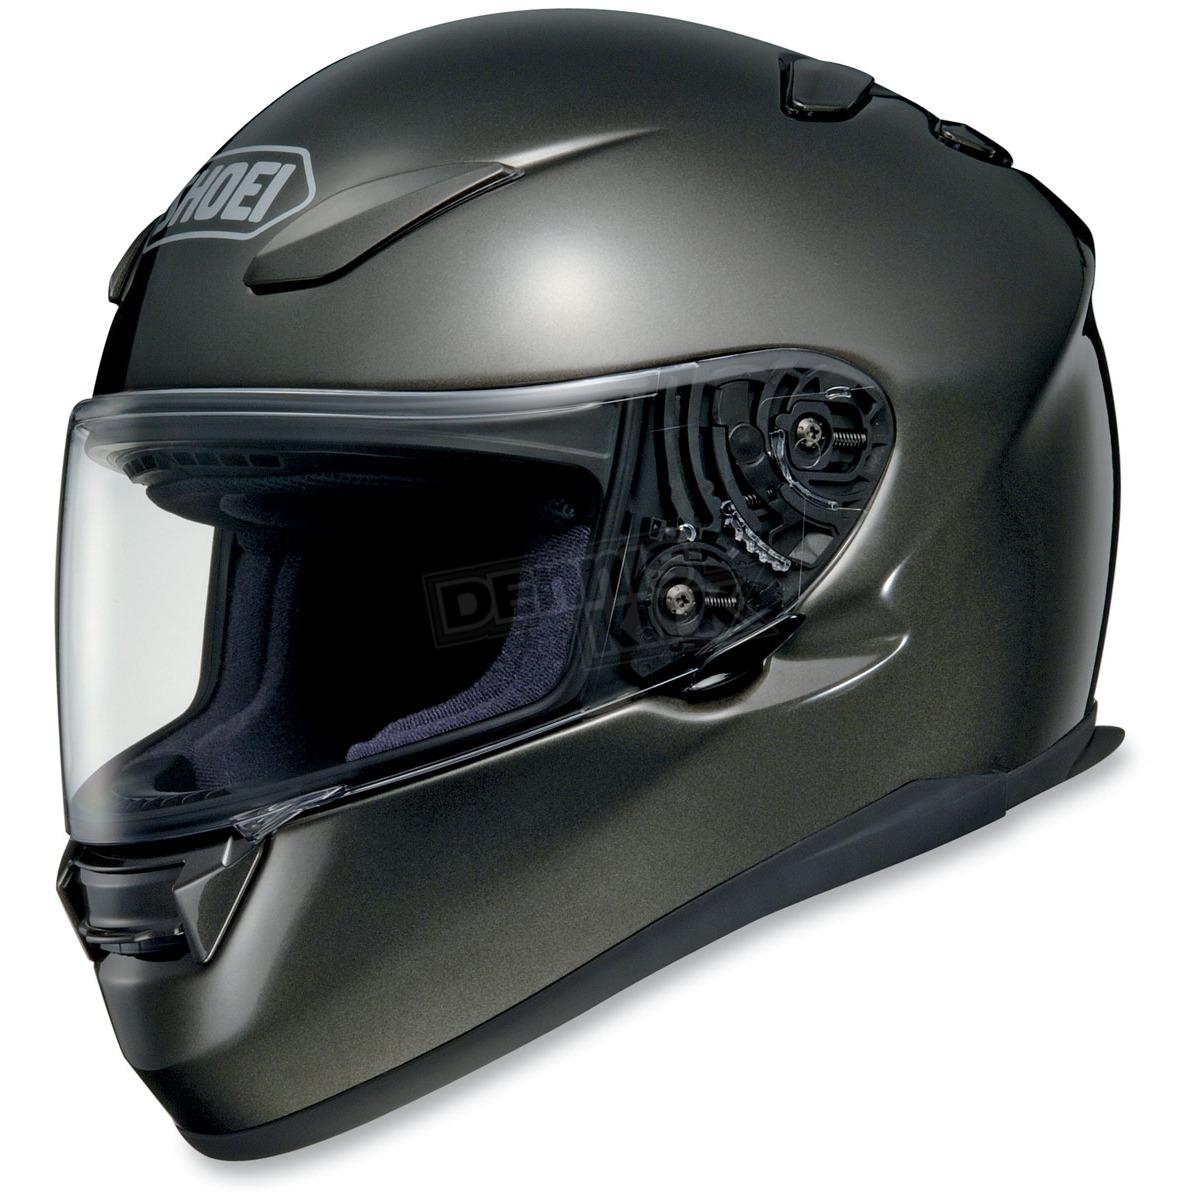 МОТОШЛЕМ SHOEI RF 1100 ANTHRACITE  Артмото - купить квадроцикл в украине и харькове, мотоцикл, снегоход, скутер, мопед, электромобиль